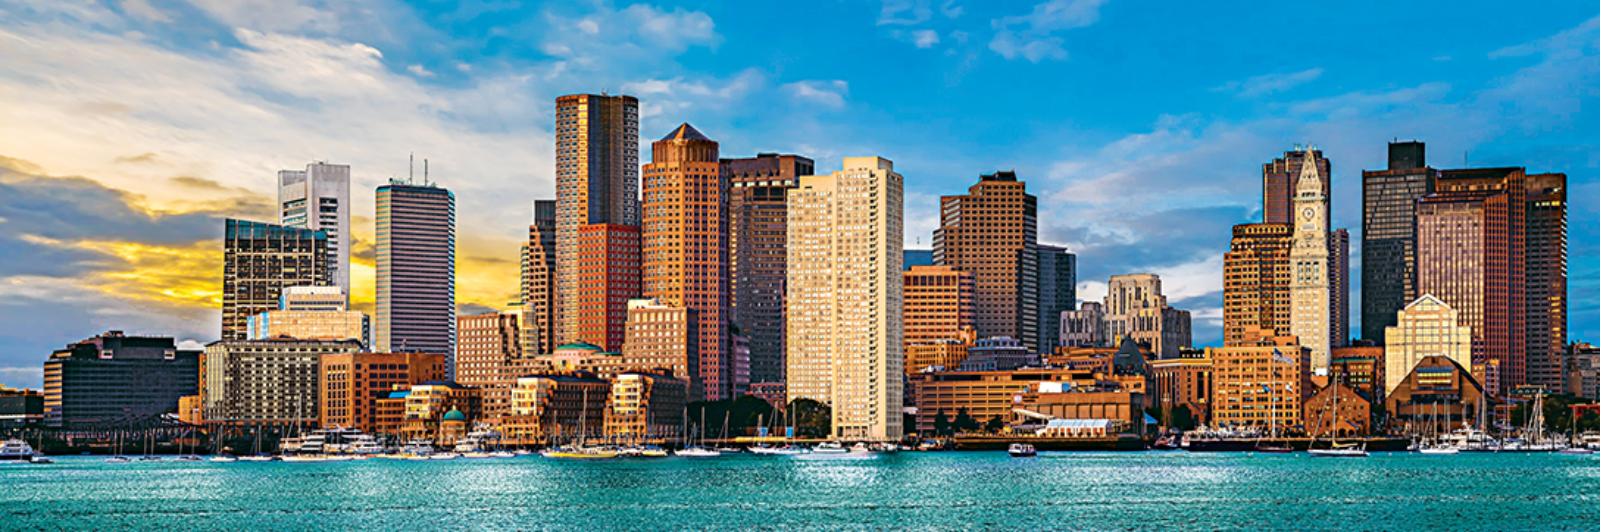 Cityscapes - Boston Skyline / Cityscape Jigsaw Puzzle